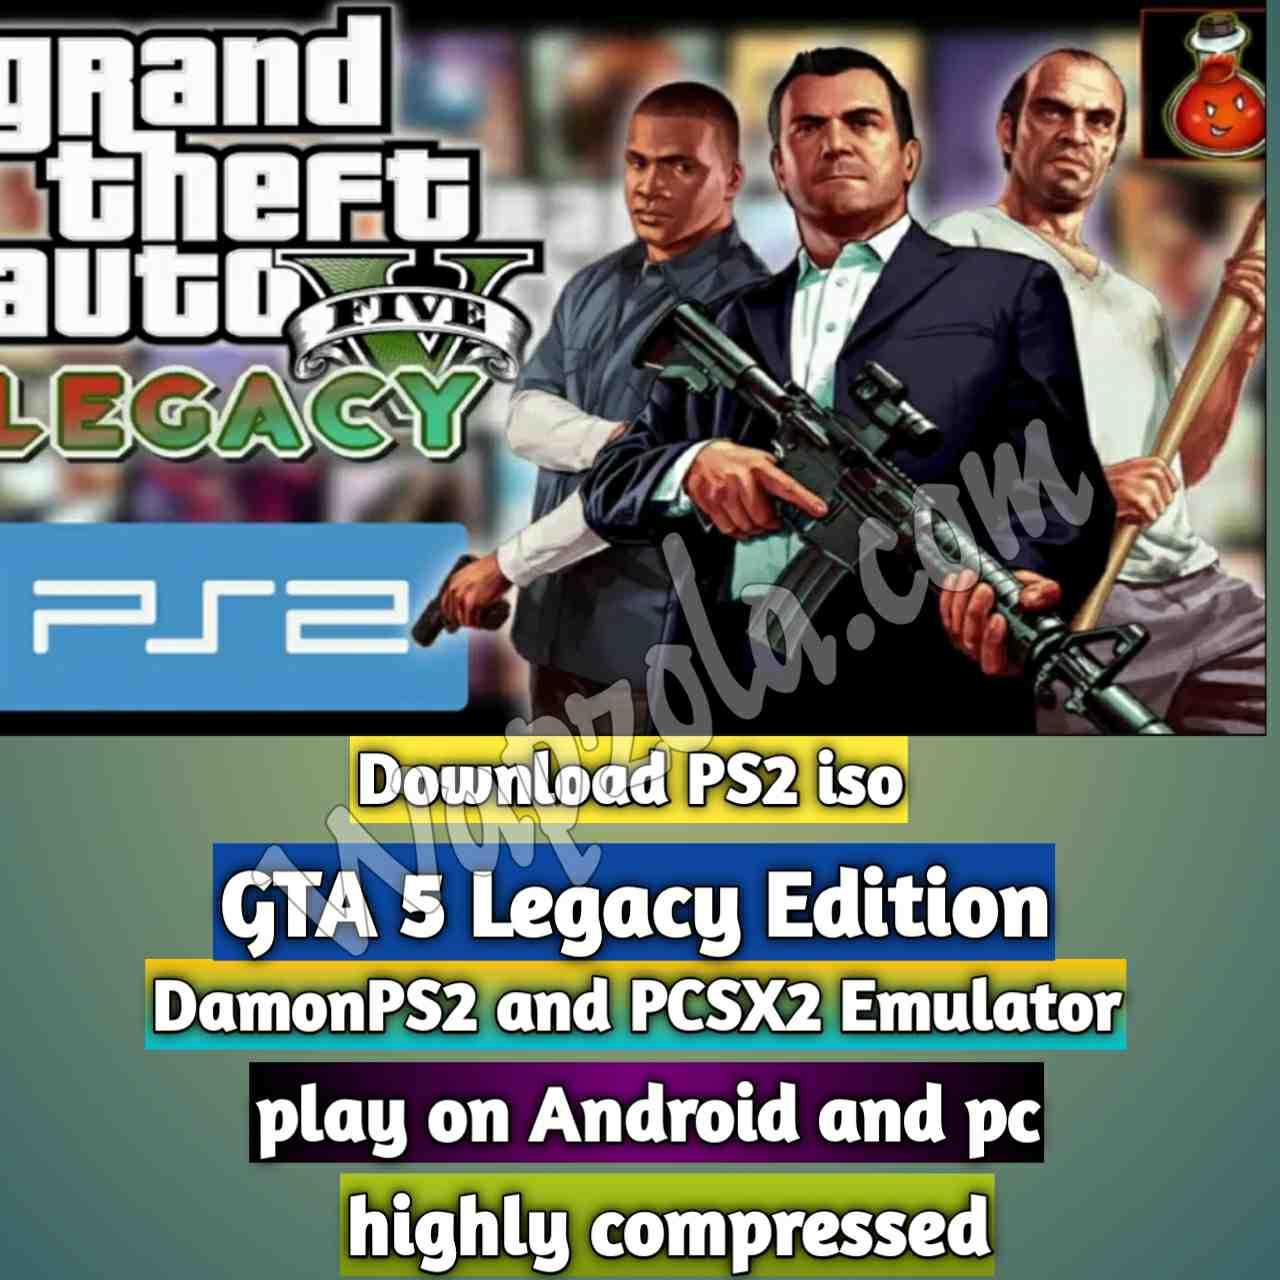 download-grand-theft-auto-v-ps2-iso-rom-damonps2-pcsx2-emulator